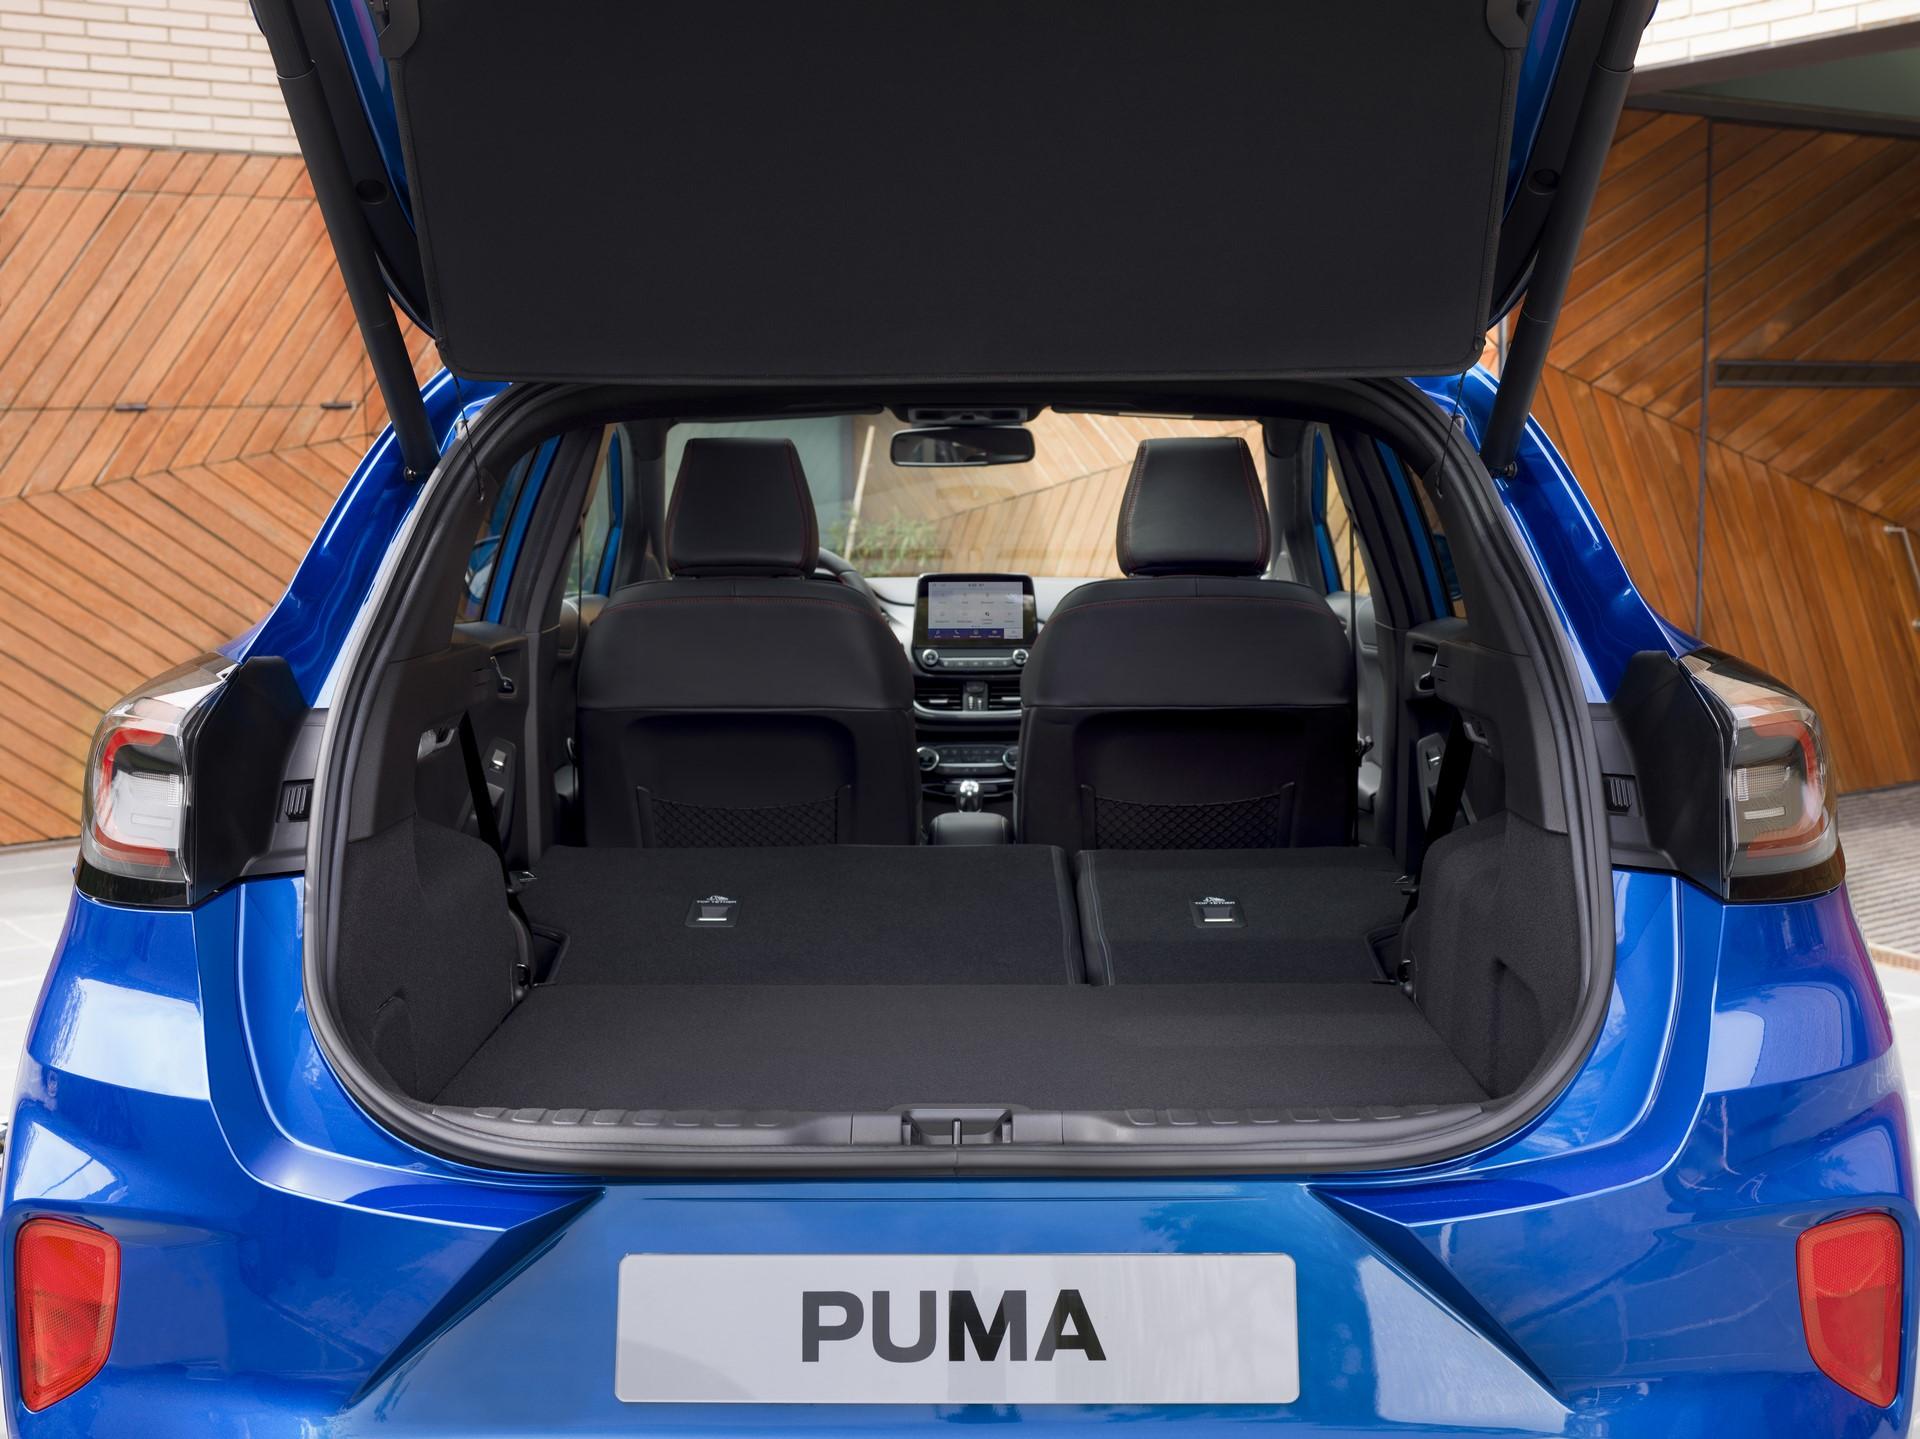 2019 FORD PUMA ST-Line Rear